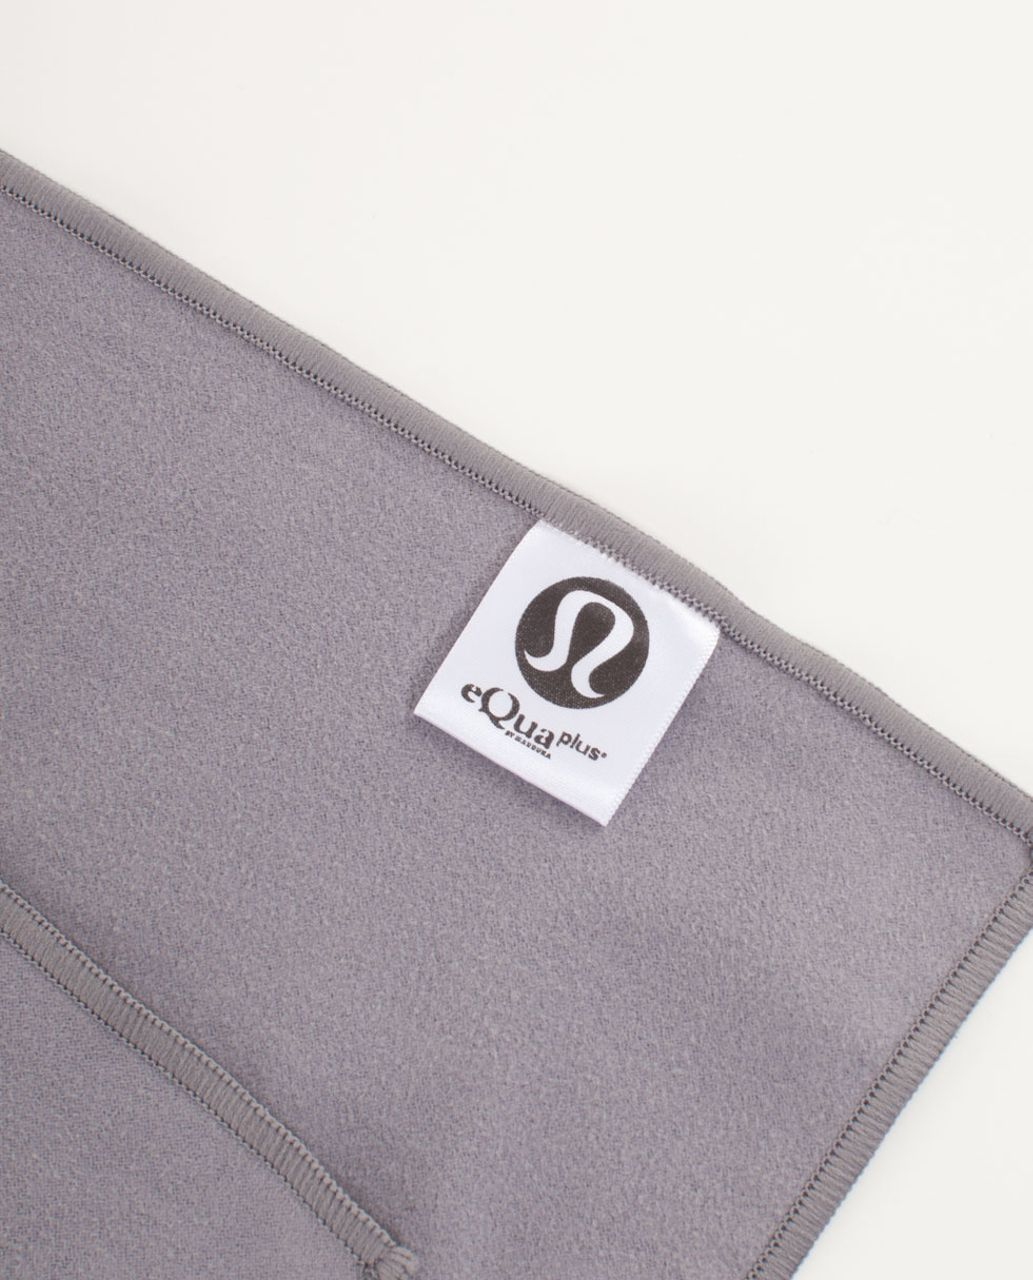 Lululemon Manduka Equa Yoga Mat Towel Blog Dandk